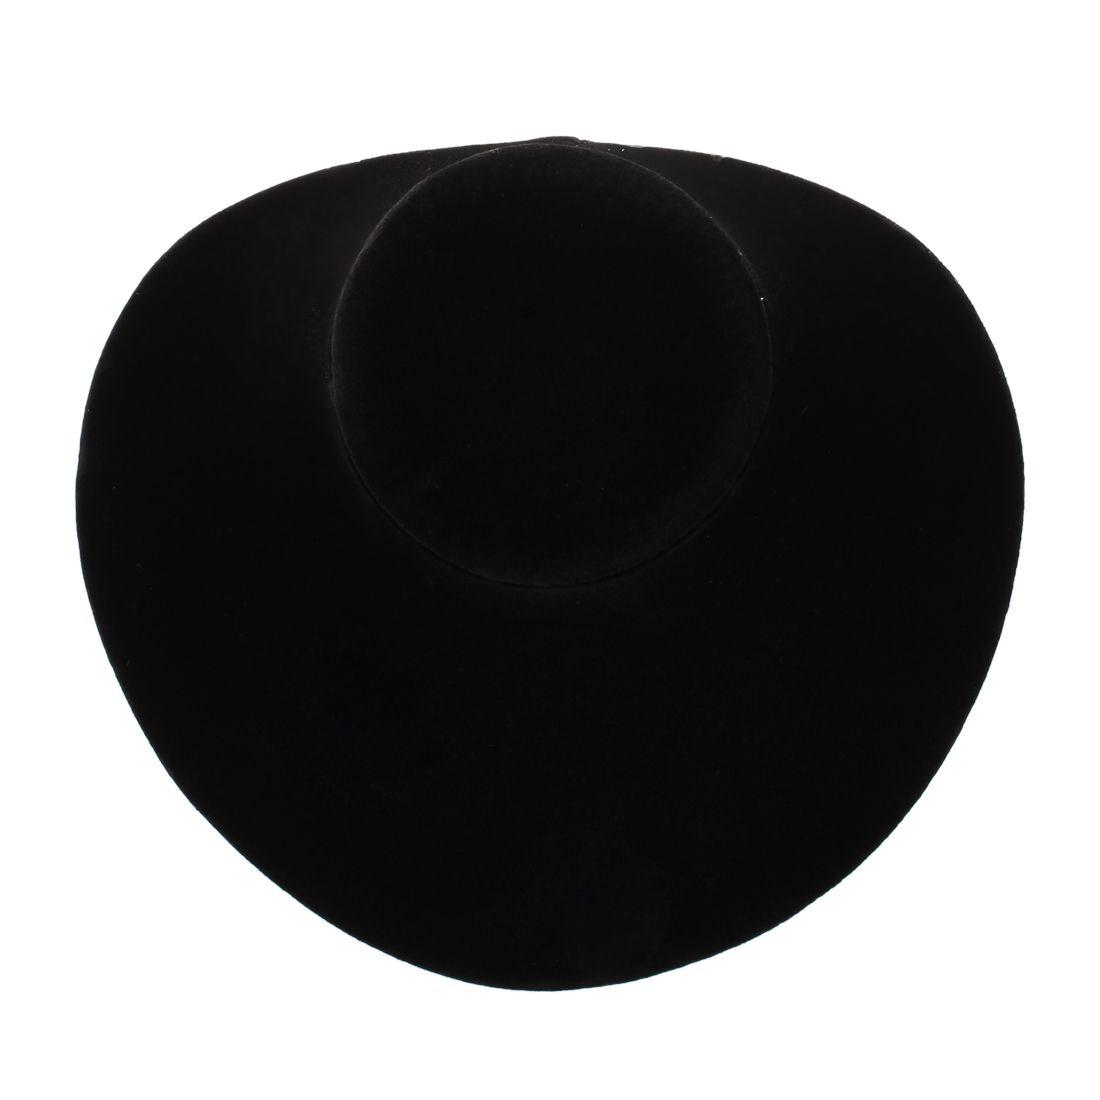 Madera Negro Collar de terciopelo Cadena Joyas Busto Display Holder Soporte Moda 150 * 150 * 140MM